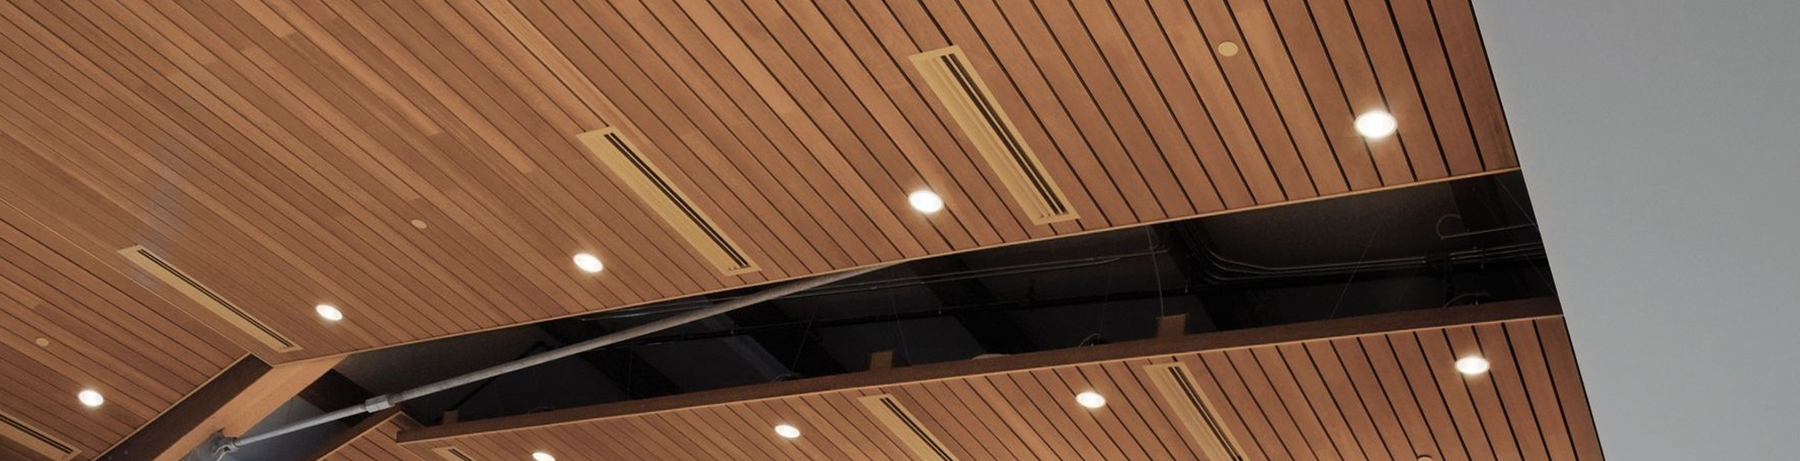 Ceiling Tiles - Wood Ceiling Tiles